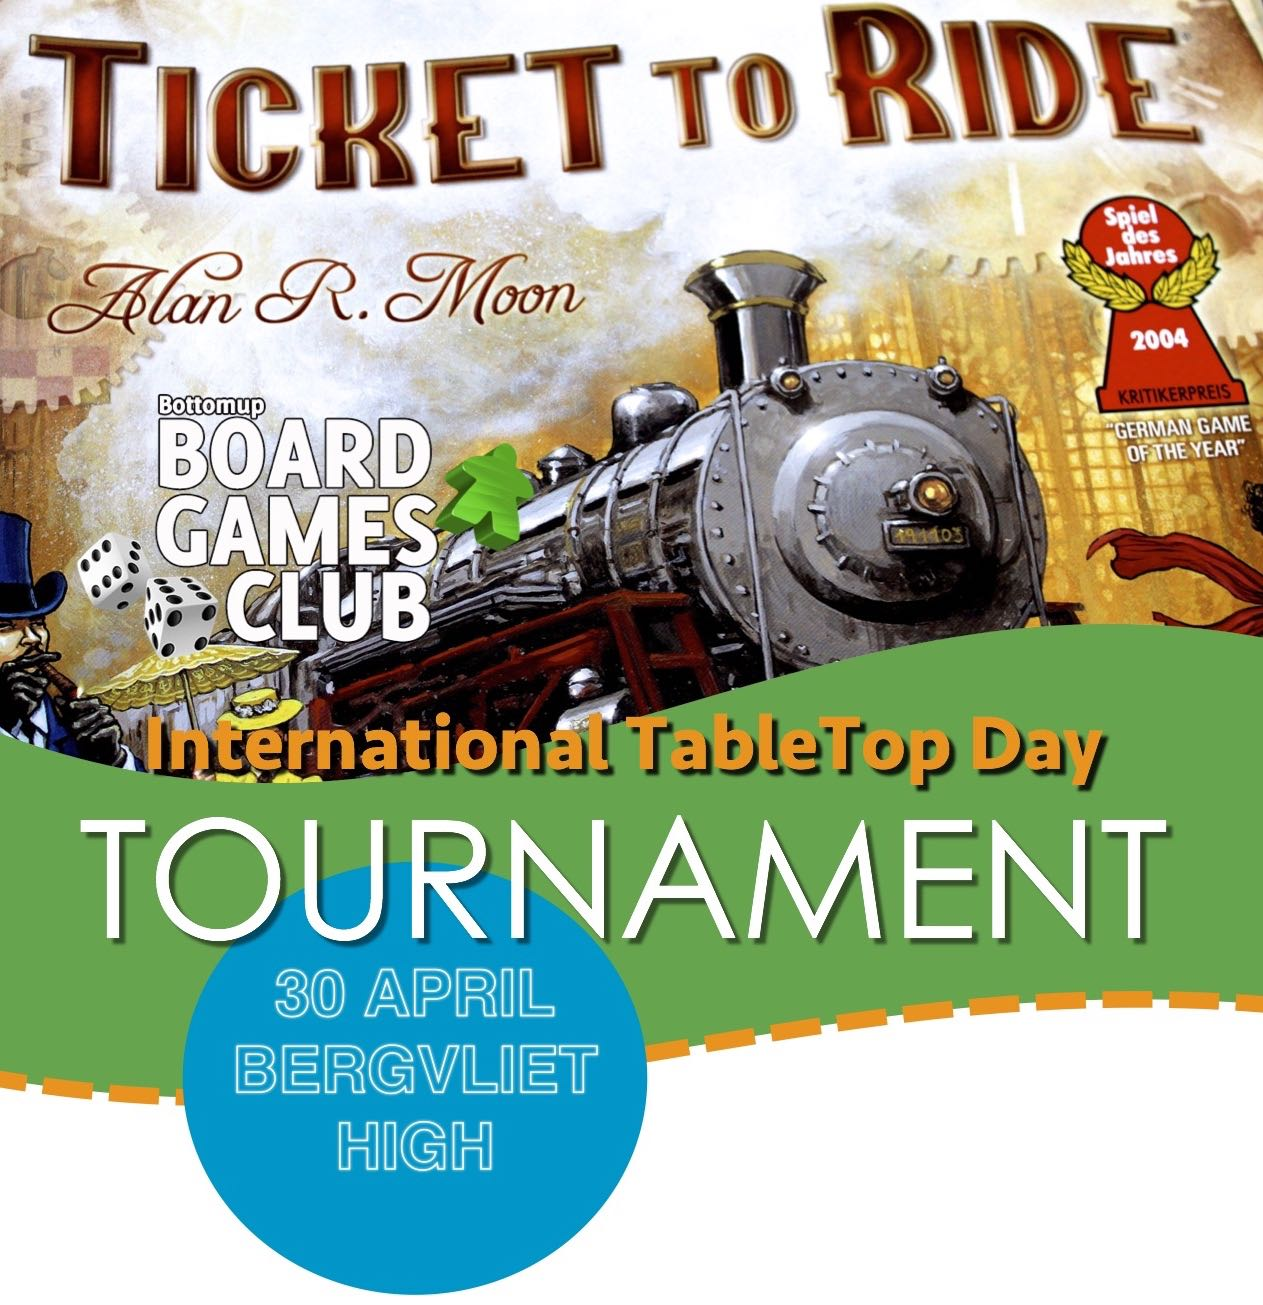 Board Games Club Tournament 2016 - Cape Town